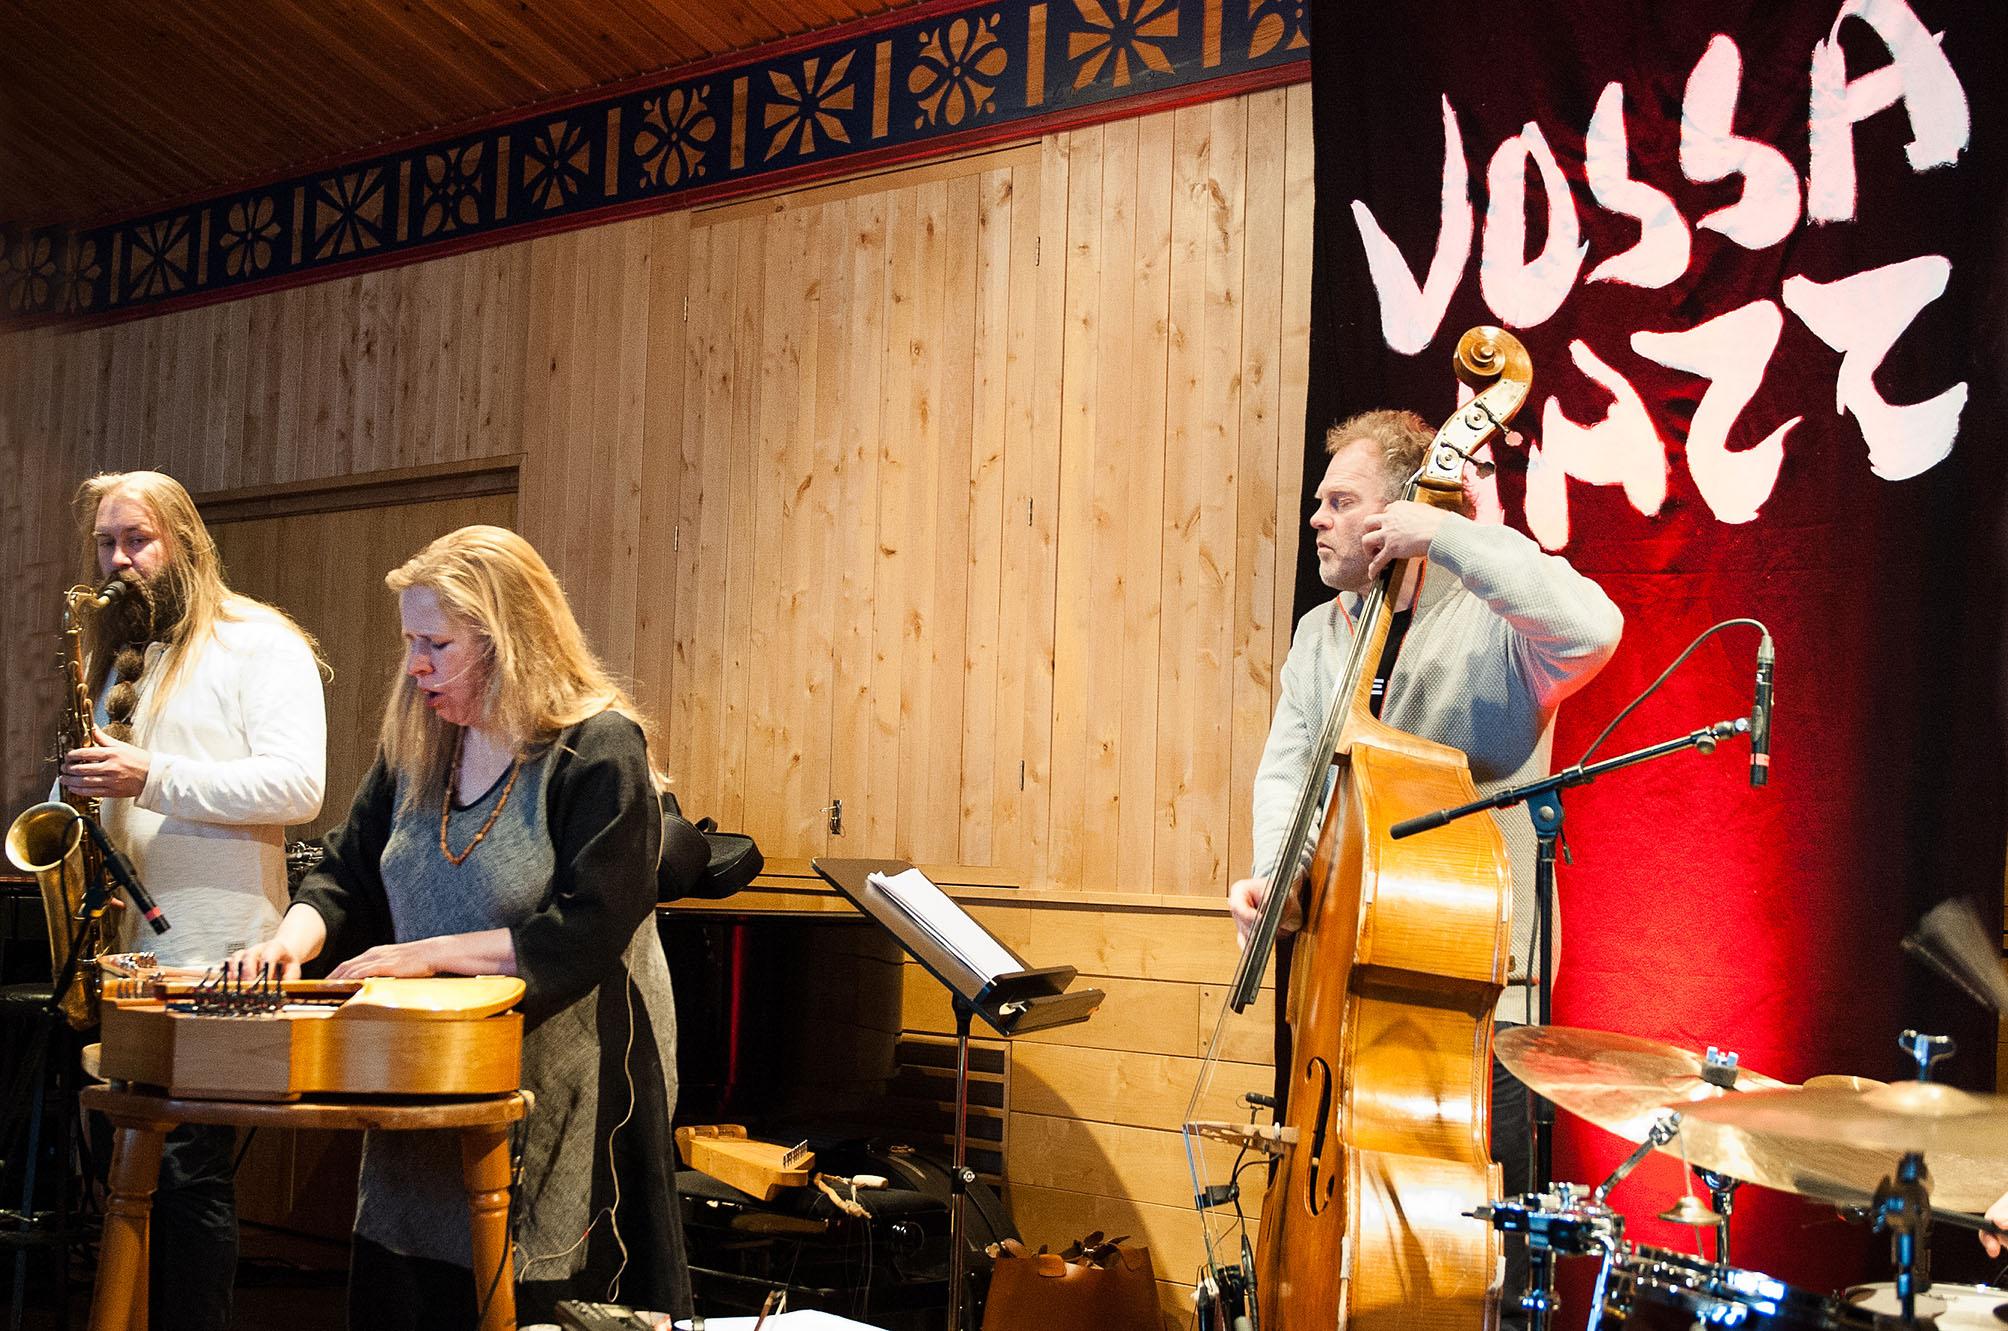 Sinikka Langeland Ensemble, 2013 Vossa Jazz Festival